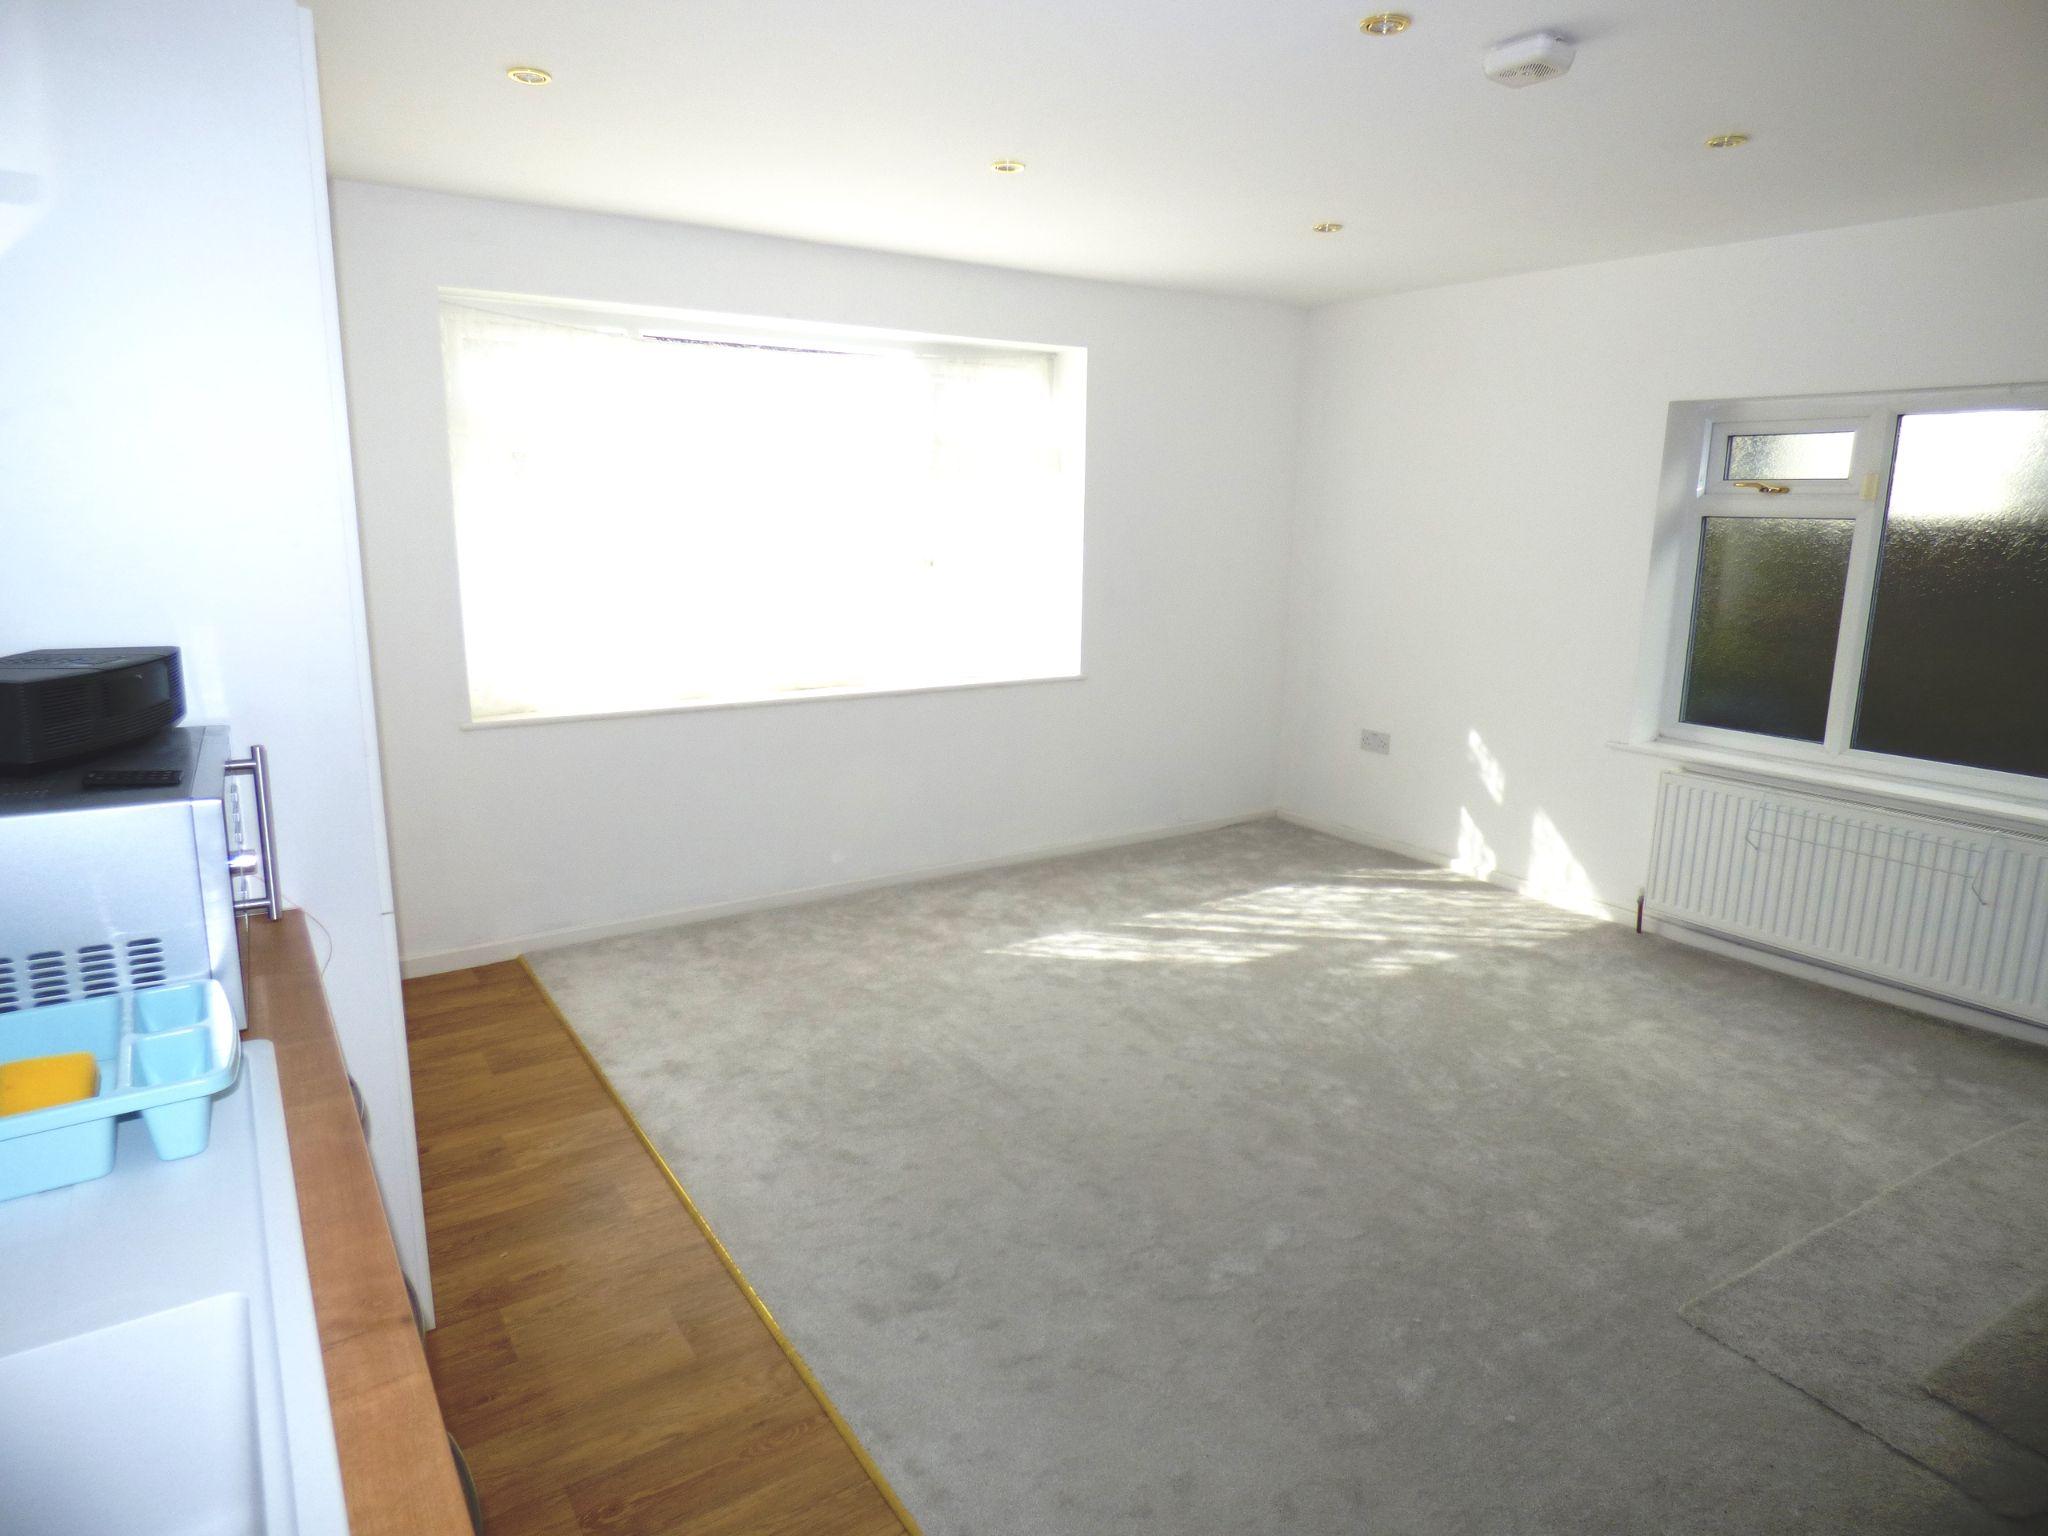 4 Bedroom Detached House For Sale - Reception Room